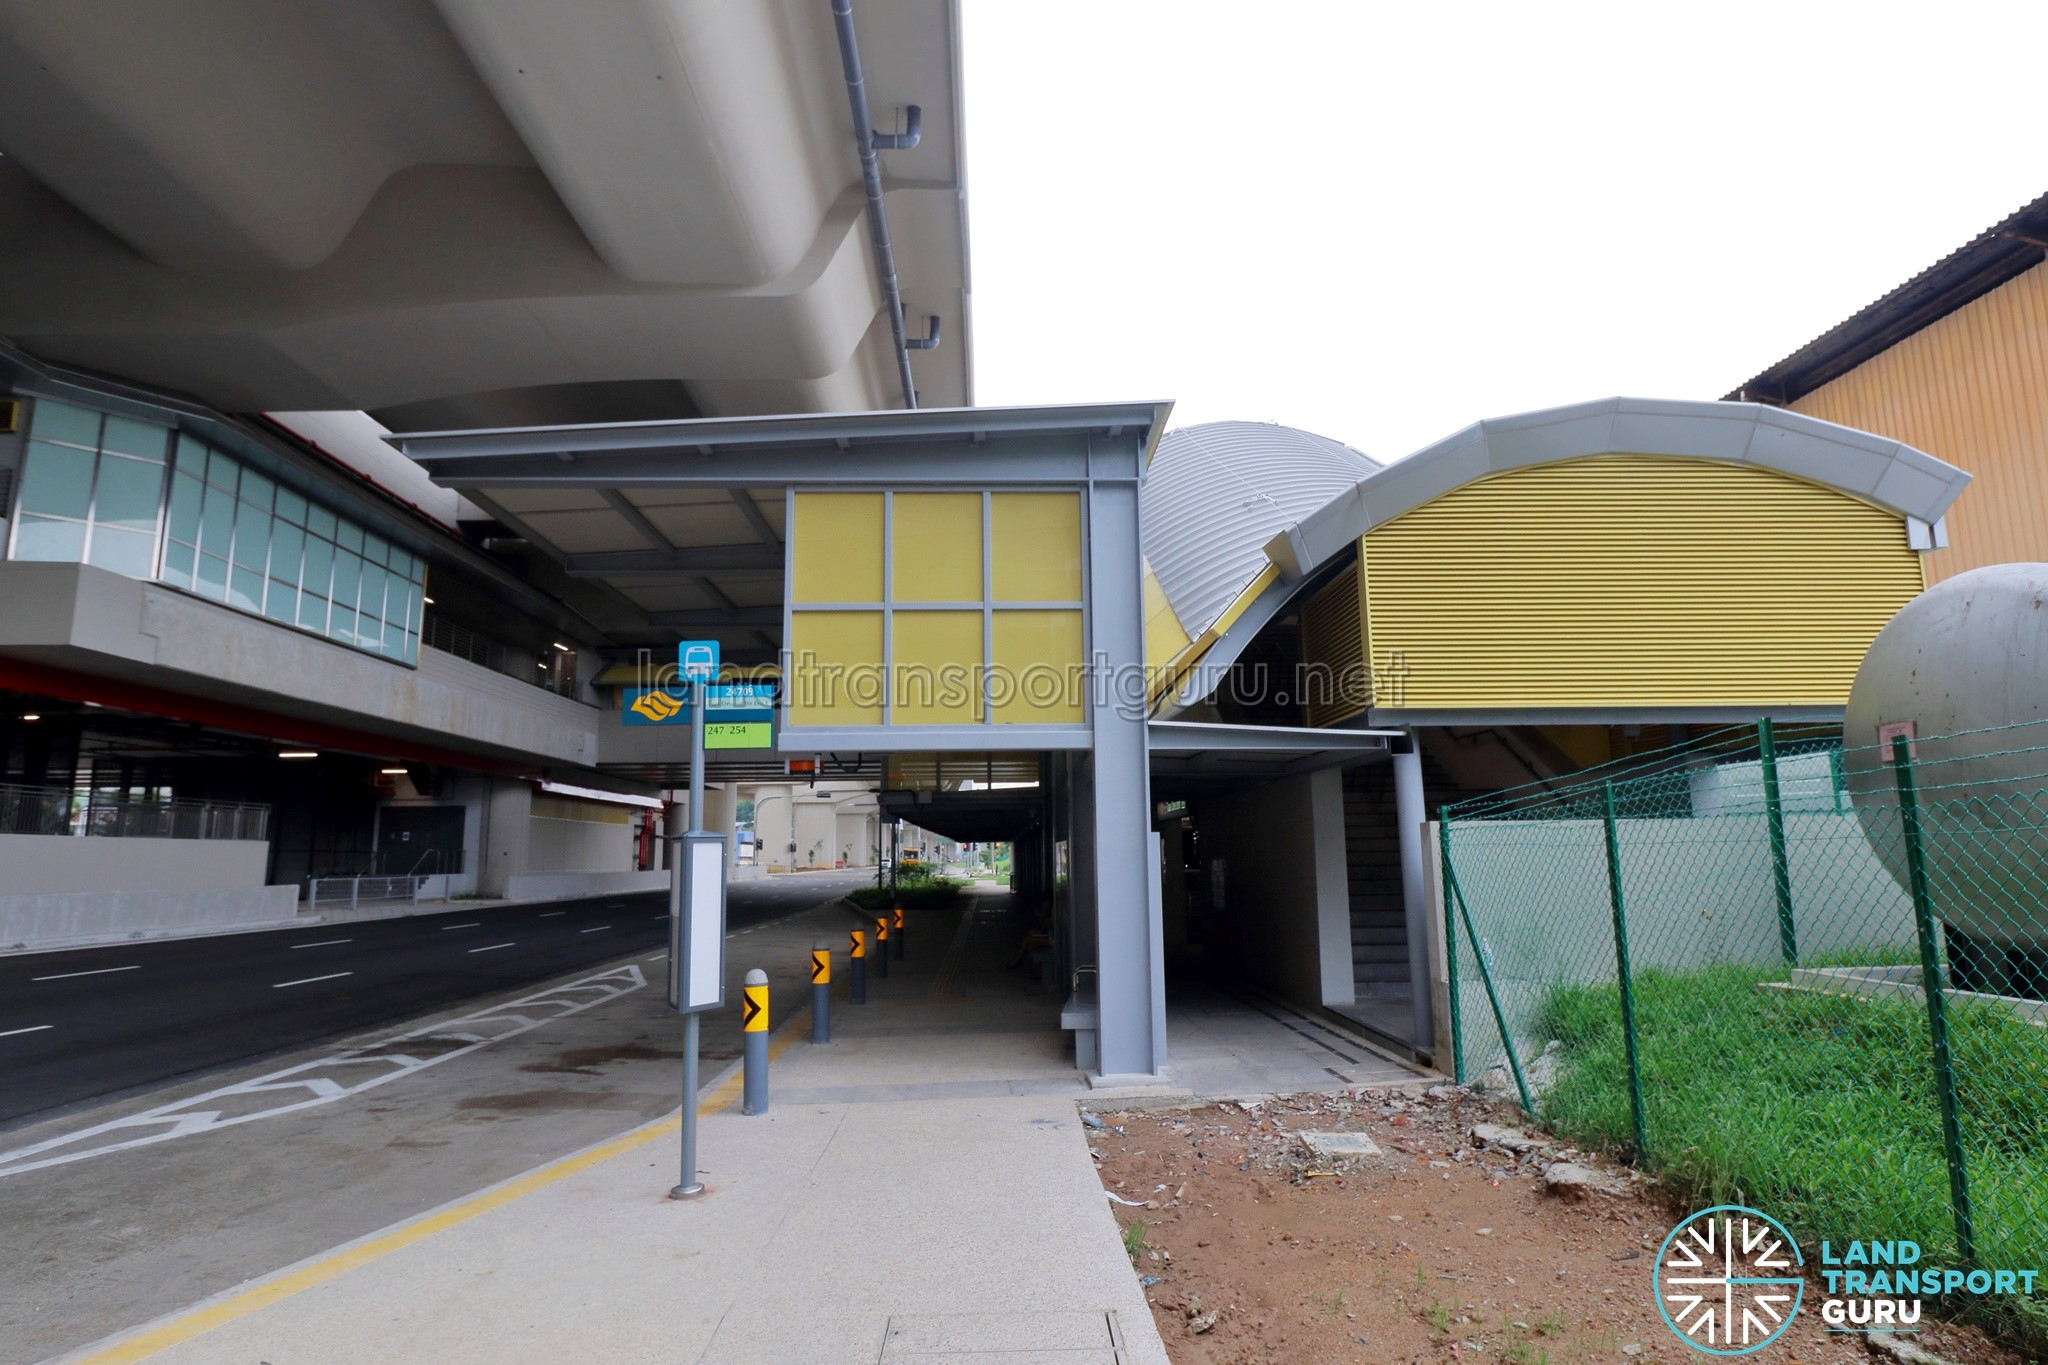 Tuas Crescent Station